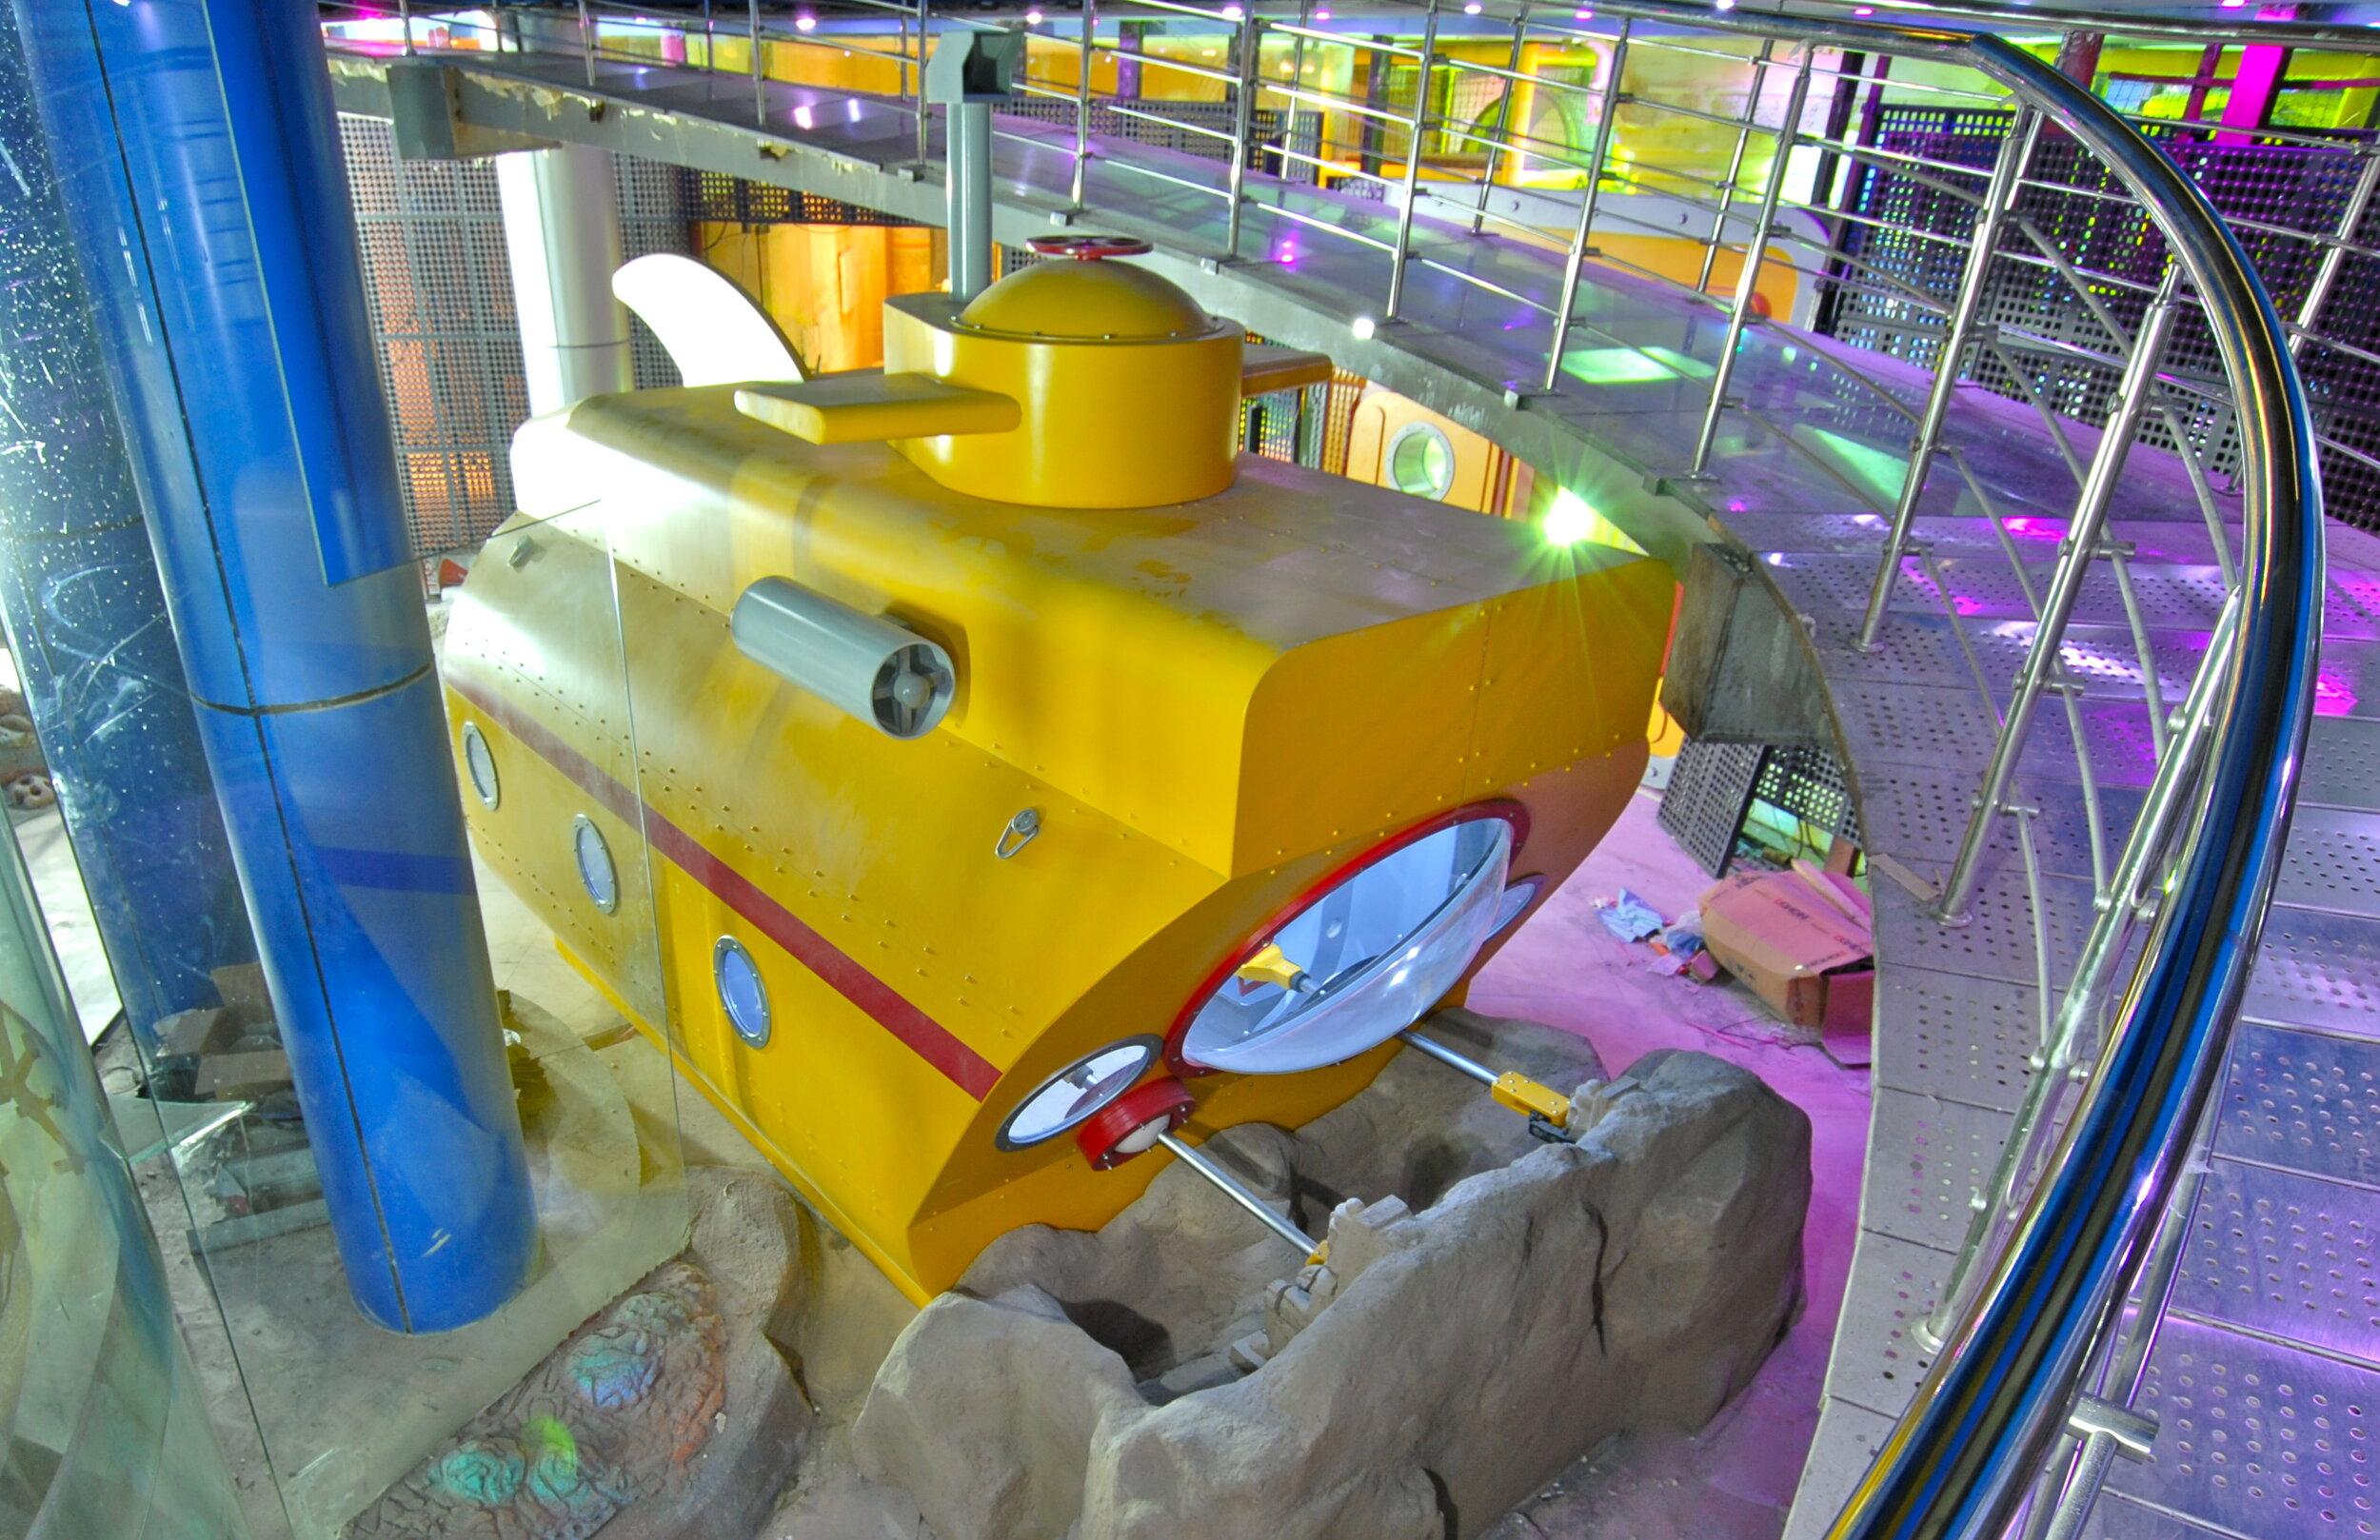 Cairo Children's Museum Research Submarine